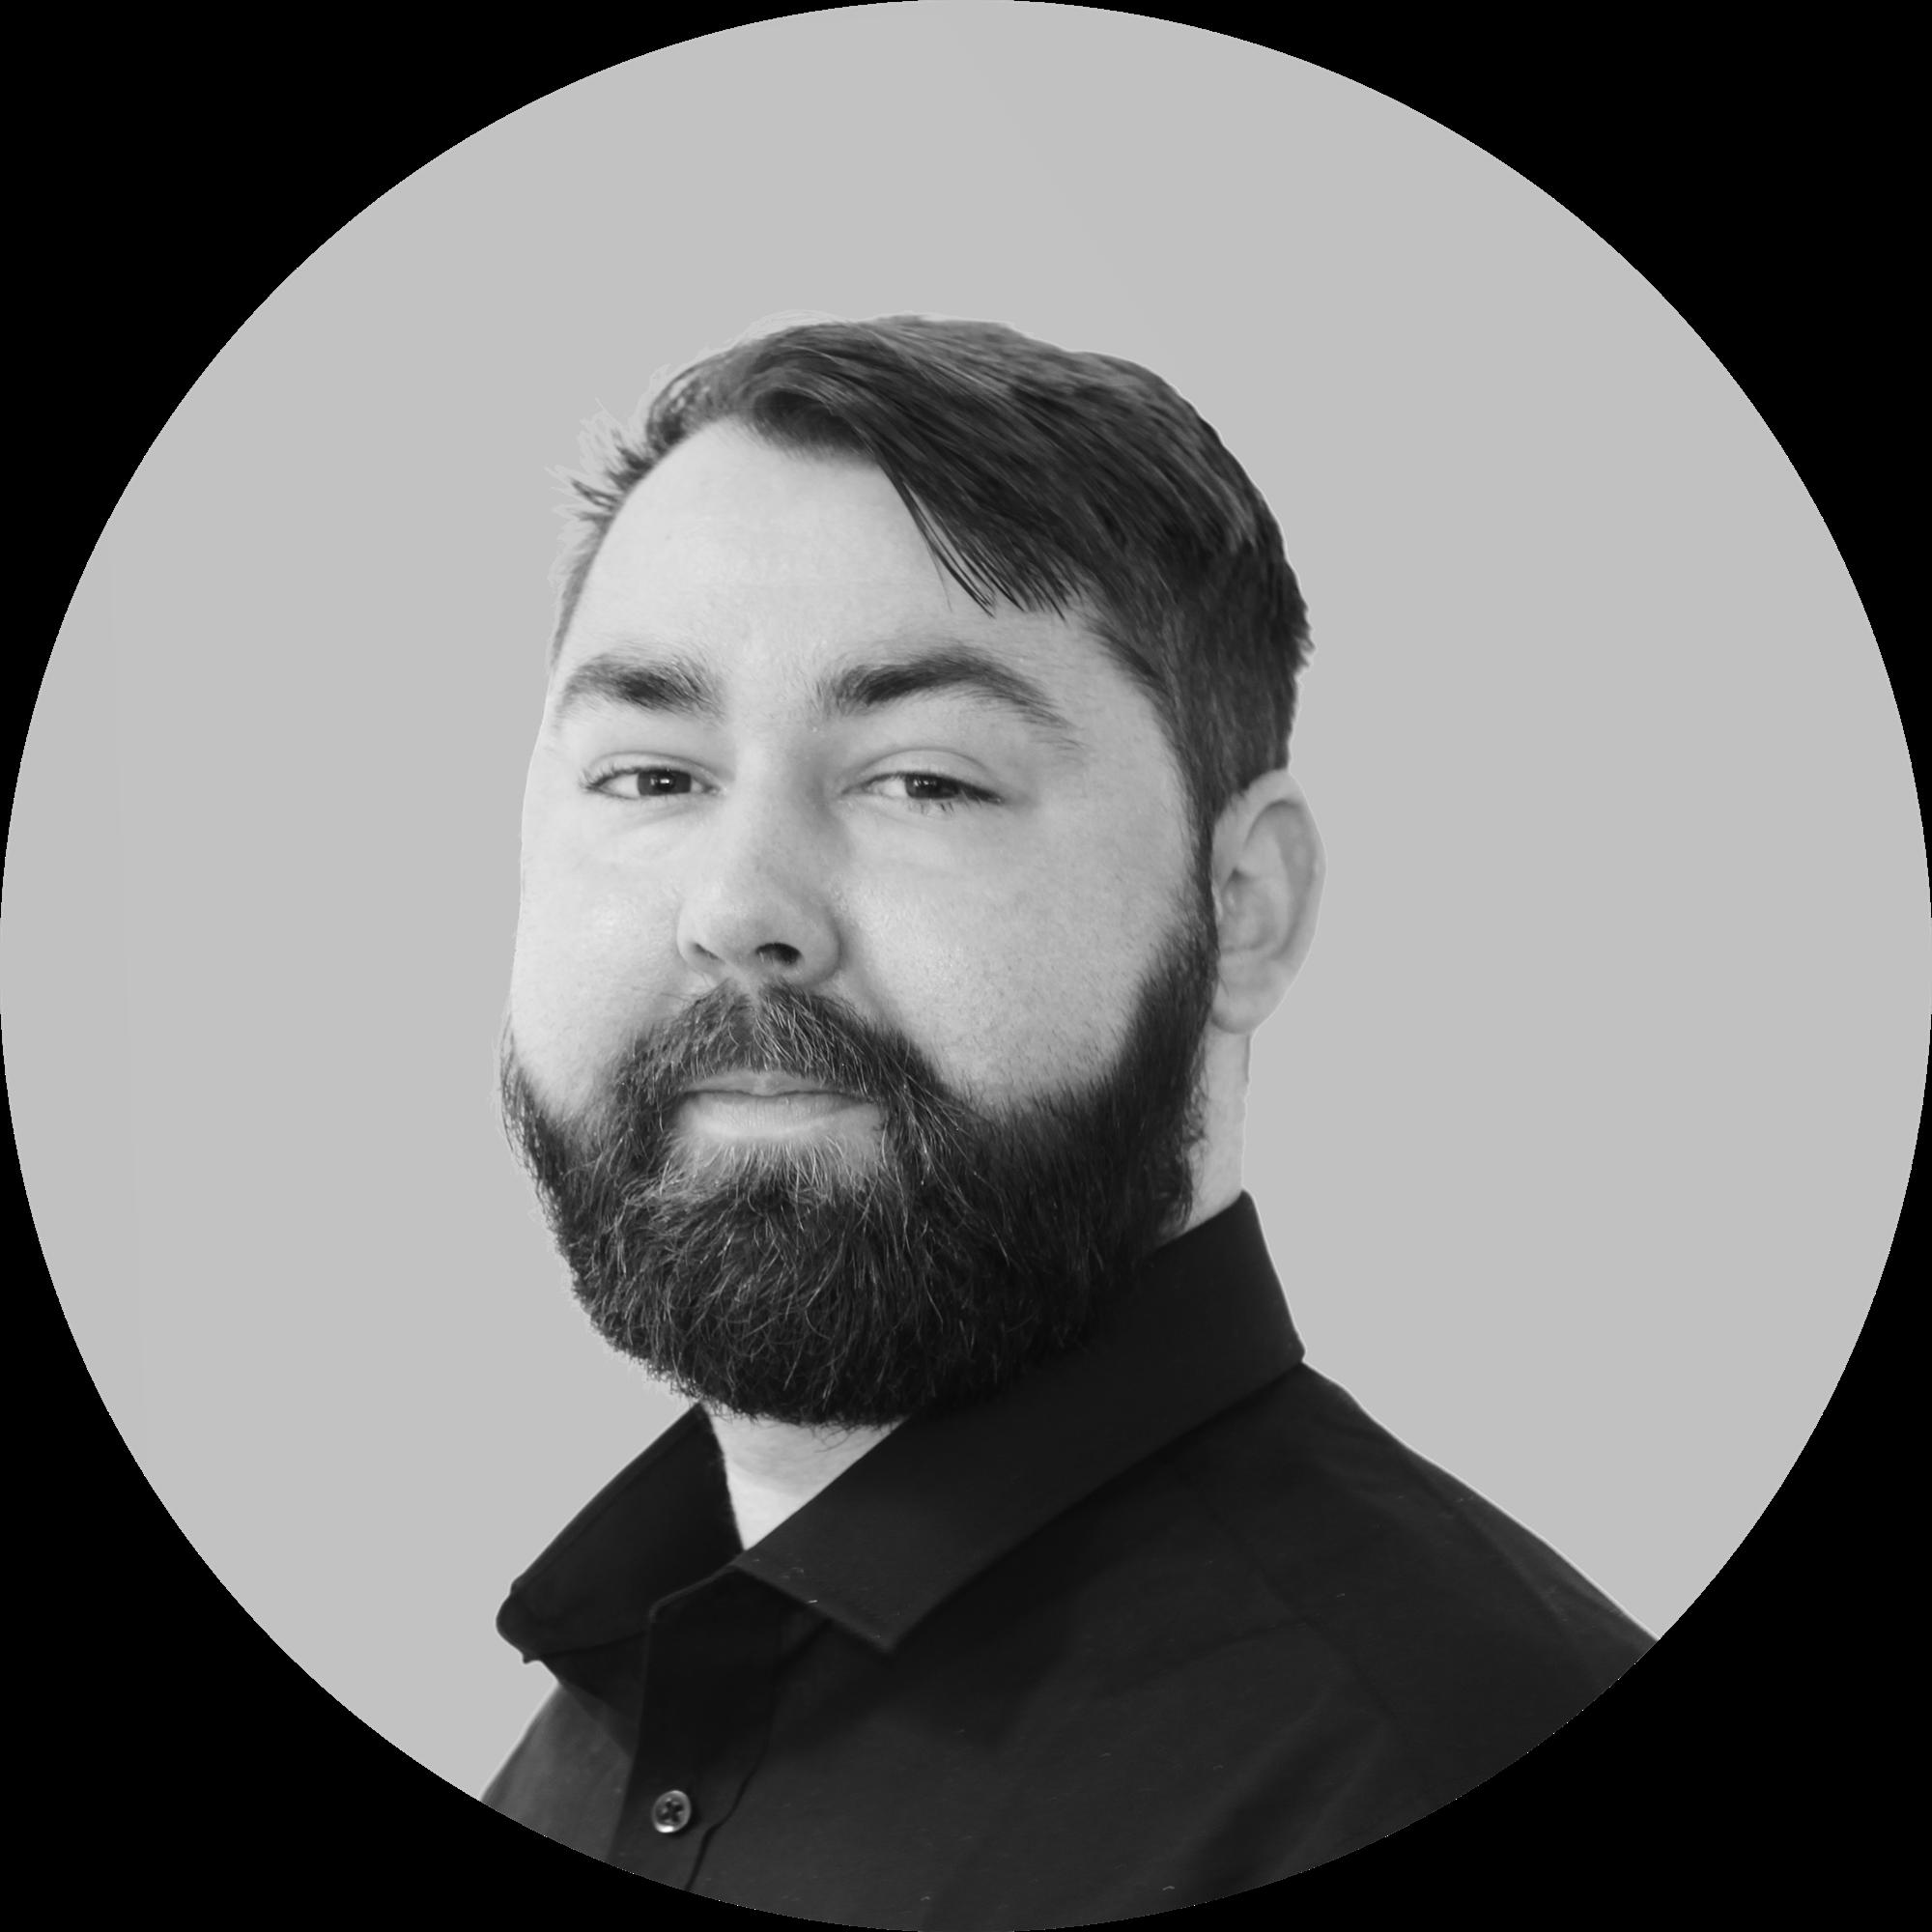 Kyle - developer